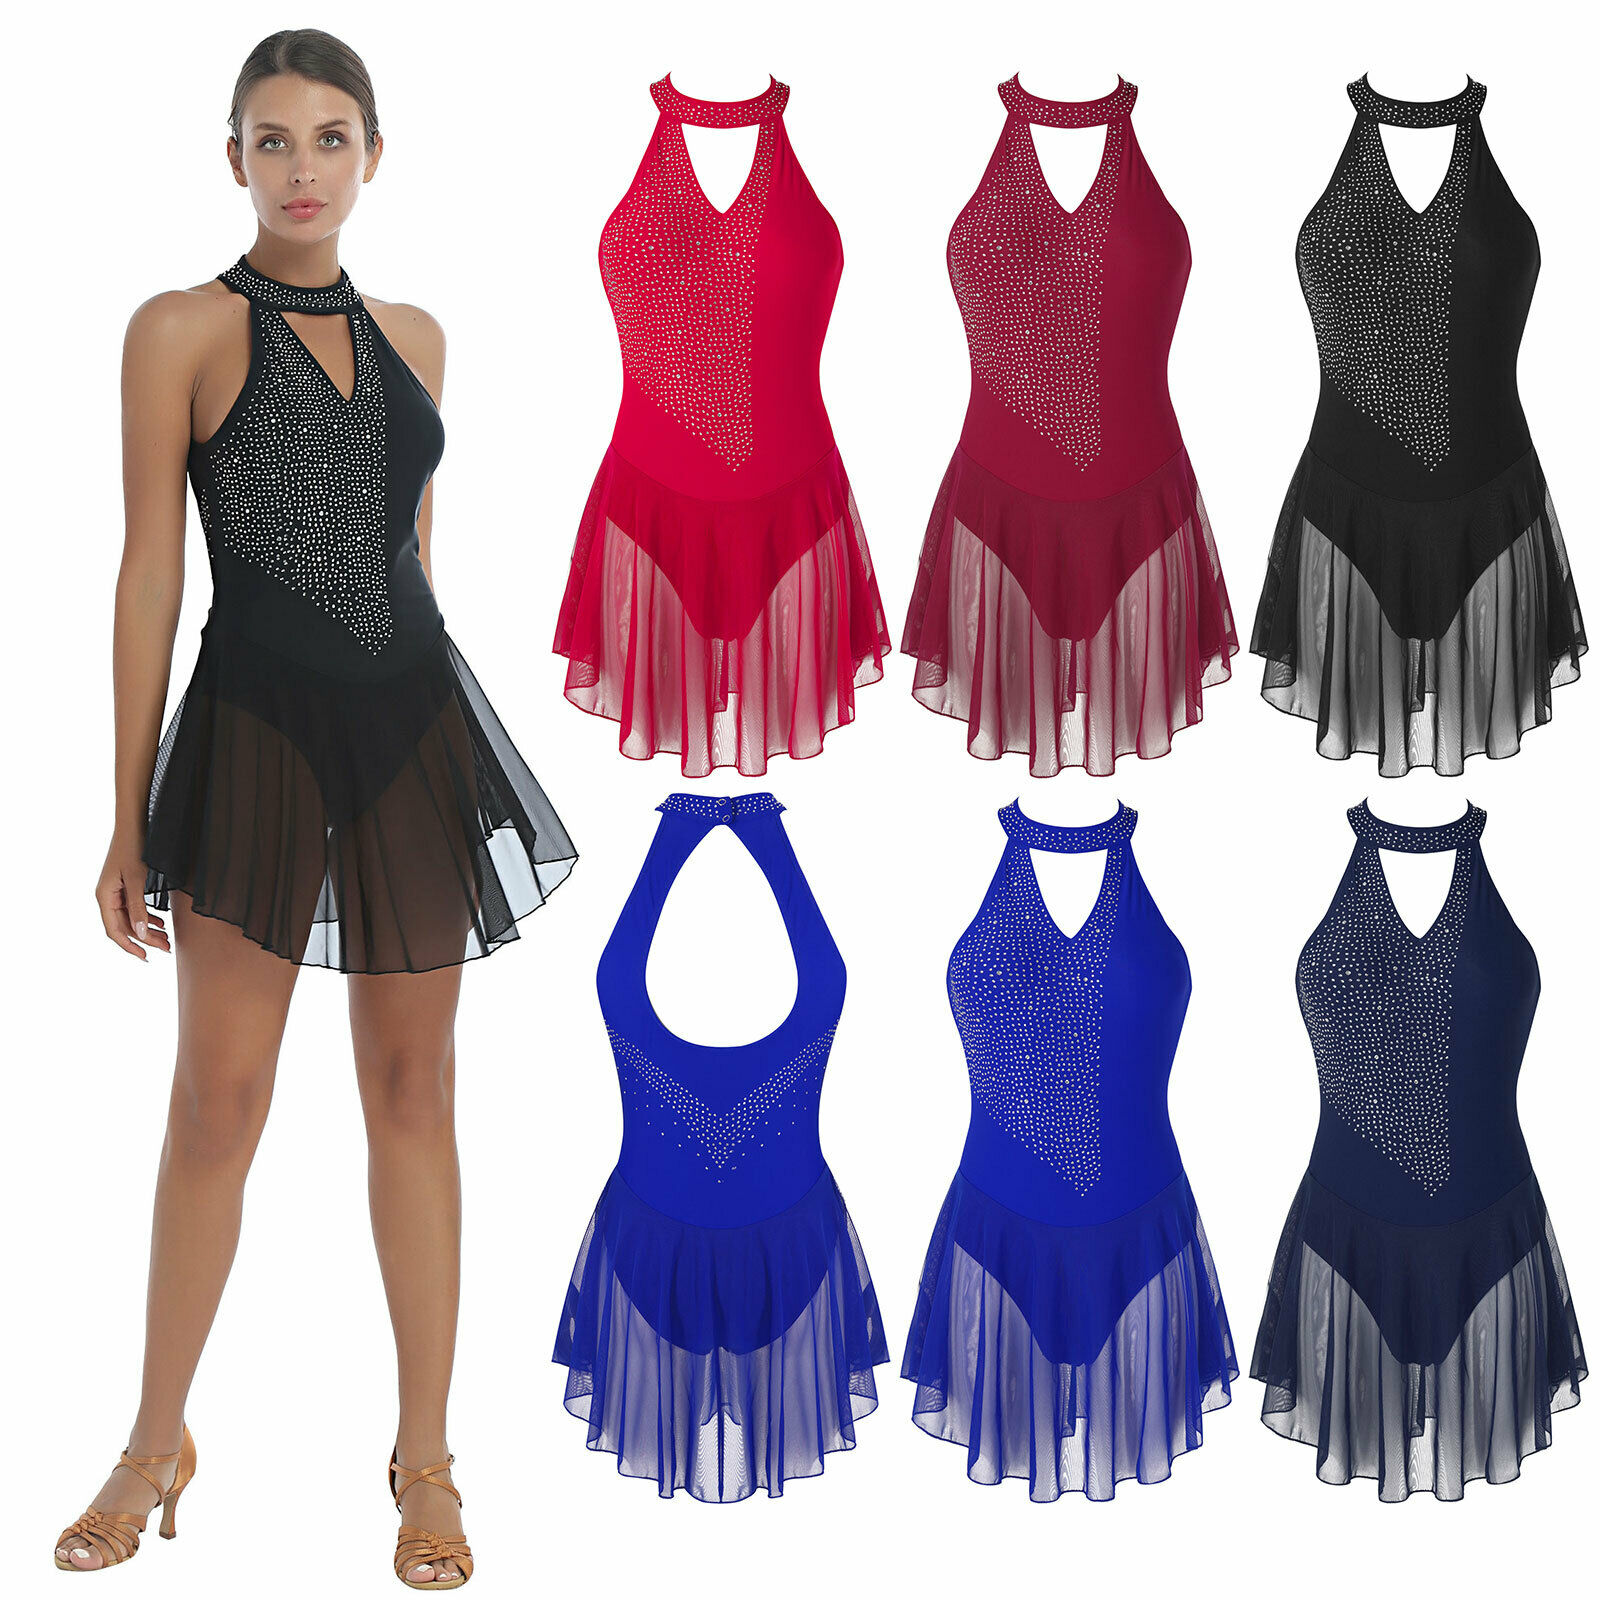 Women's Gymnastics Leotard Dance Dress Shiny Backless Figure Skating Skirted